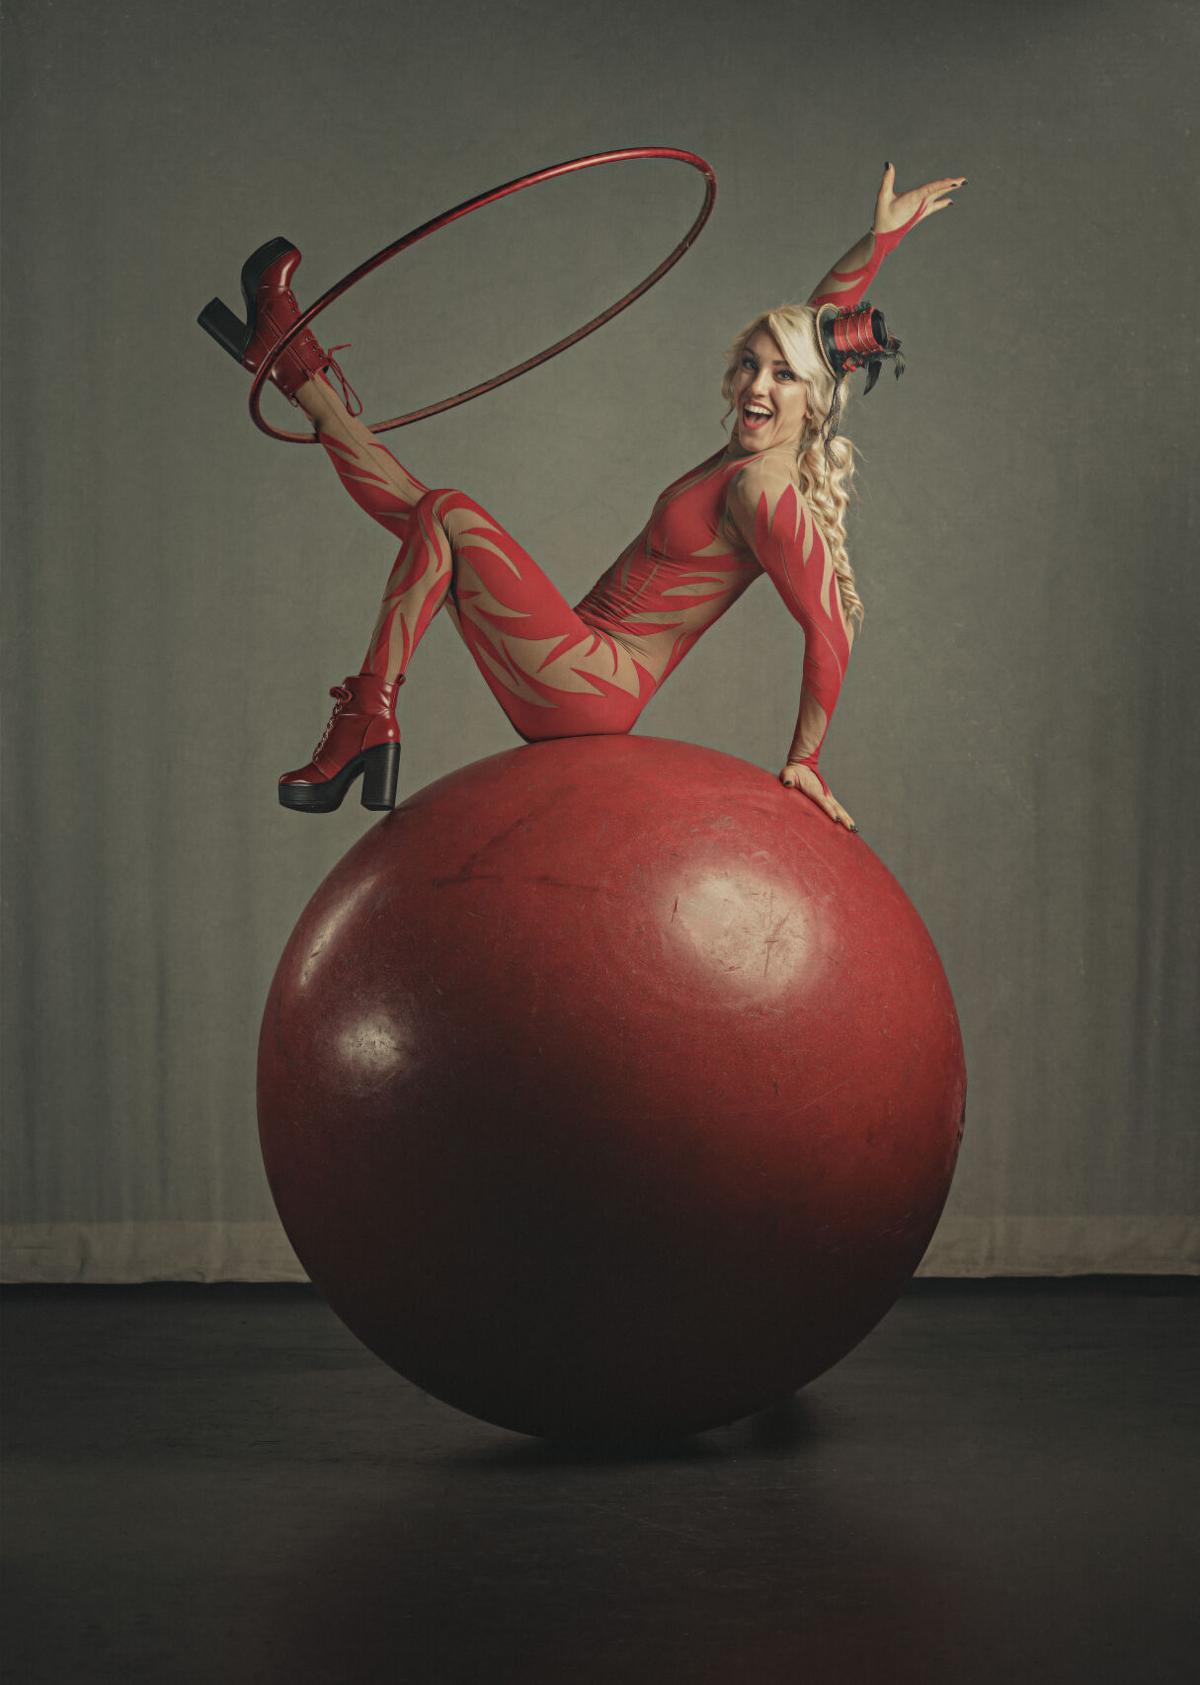 Grace Good Action Shot with Hula Hoop & Big Red Ball-2.JPG